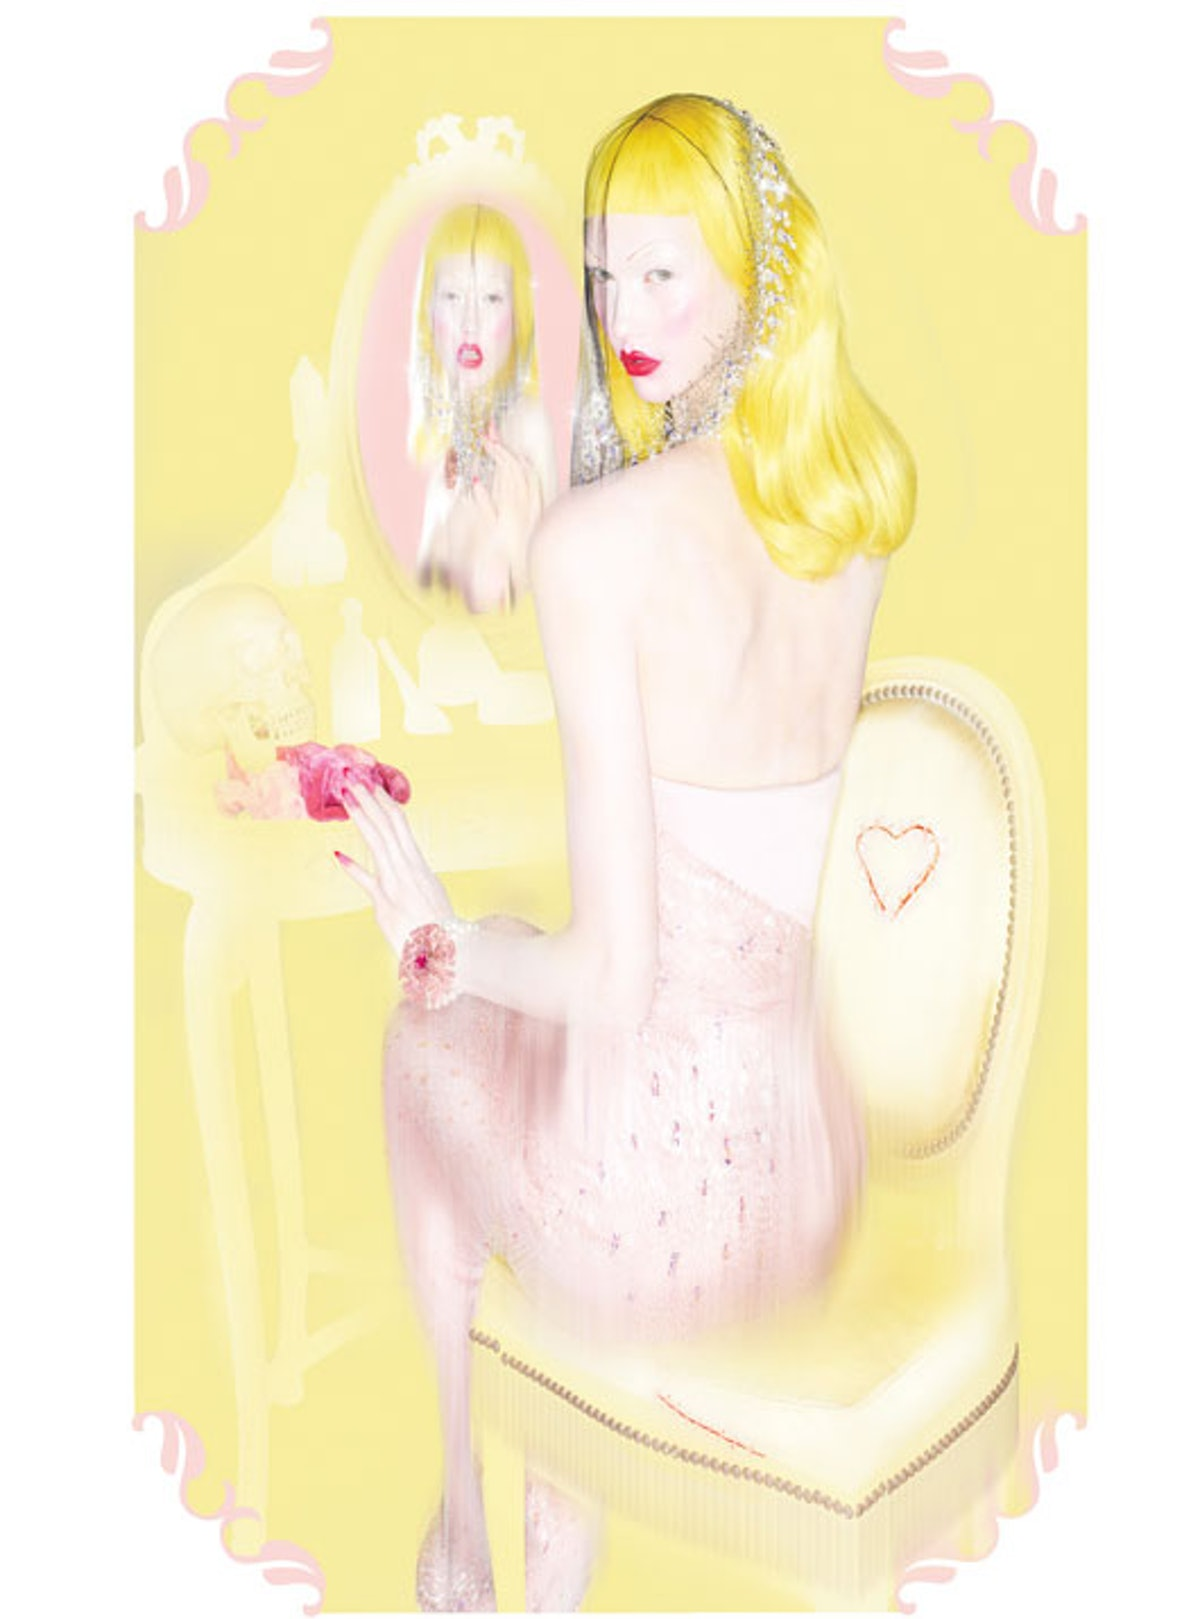 fass-nick-night-couture-06-l.jpg